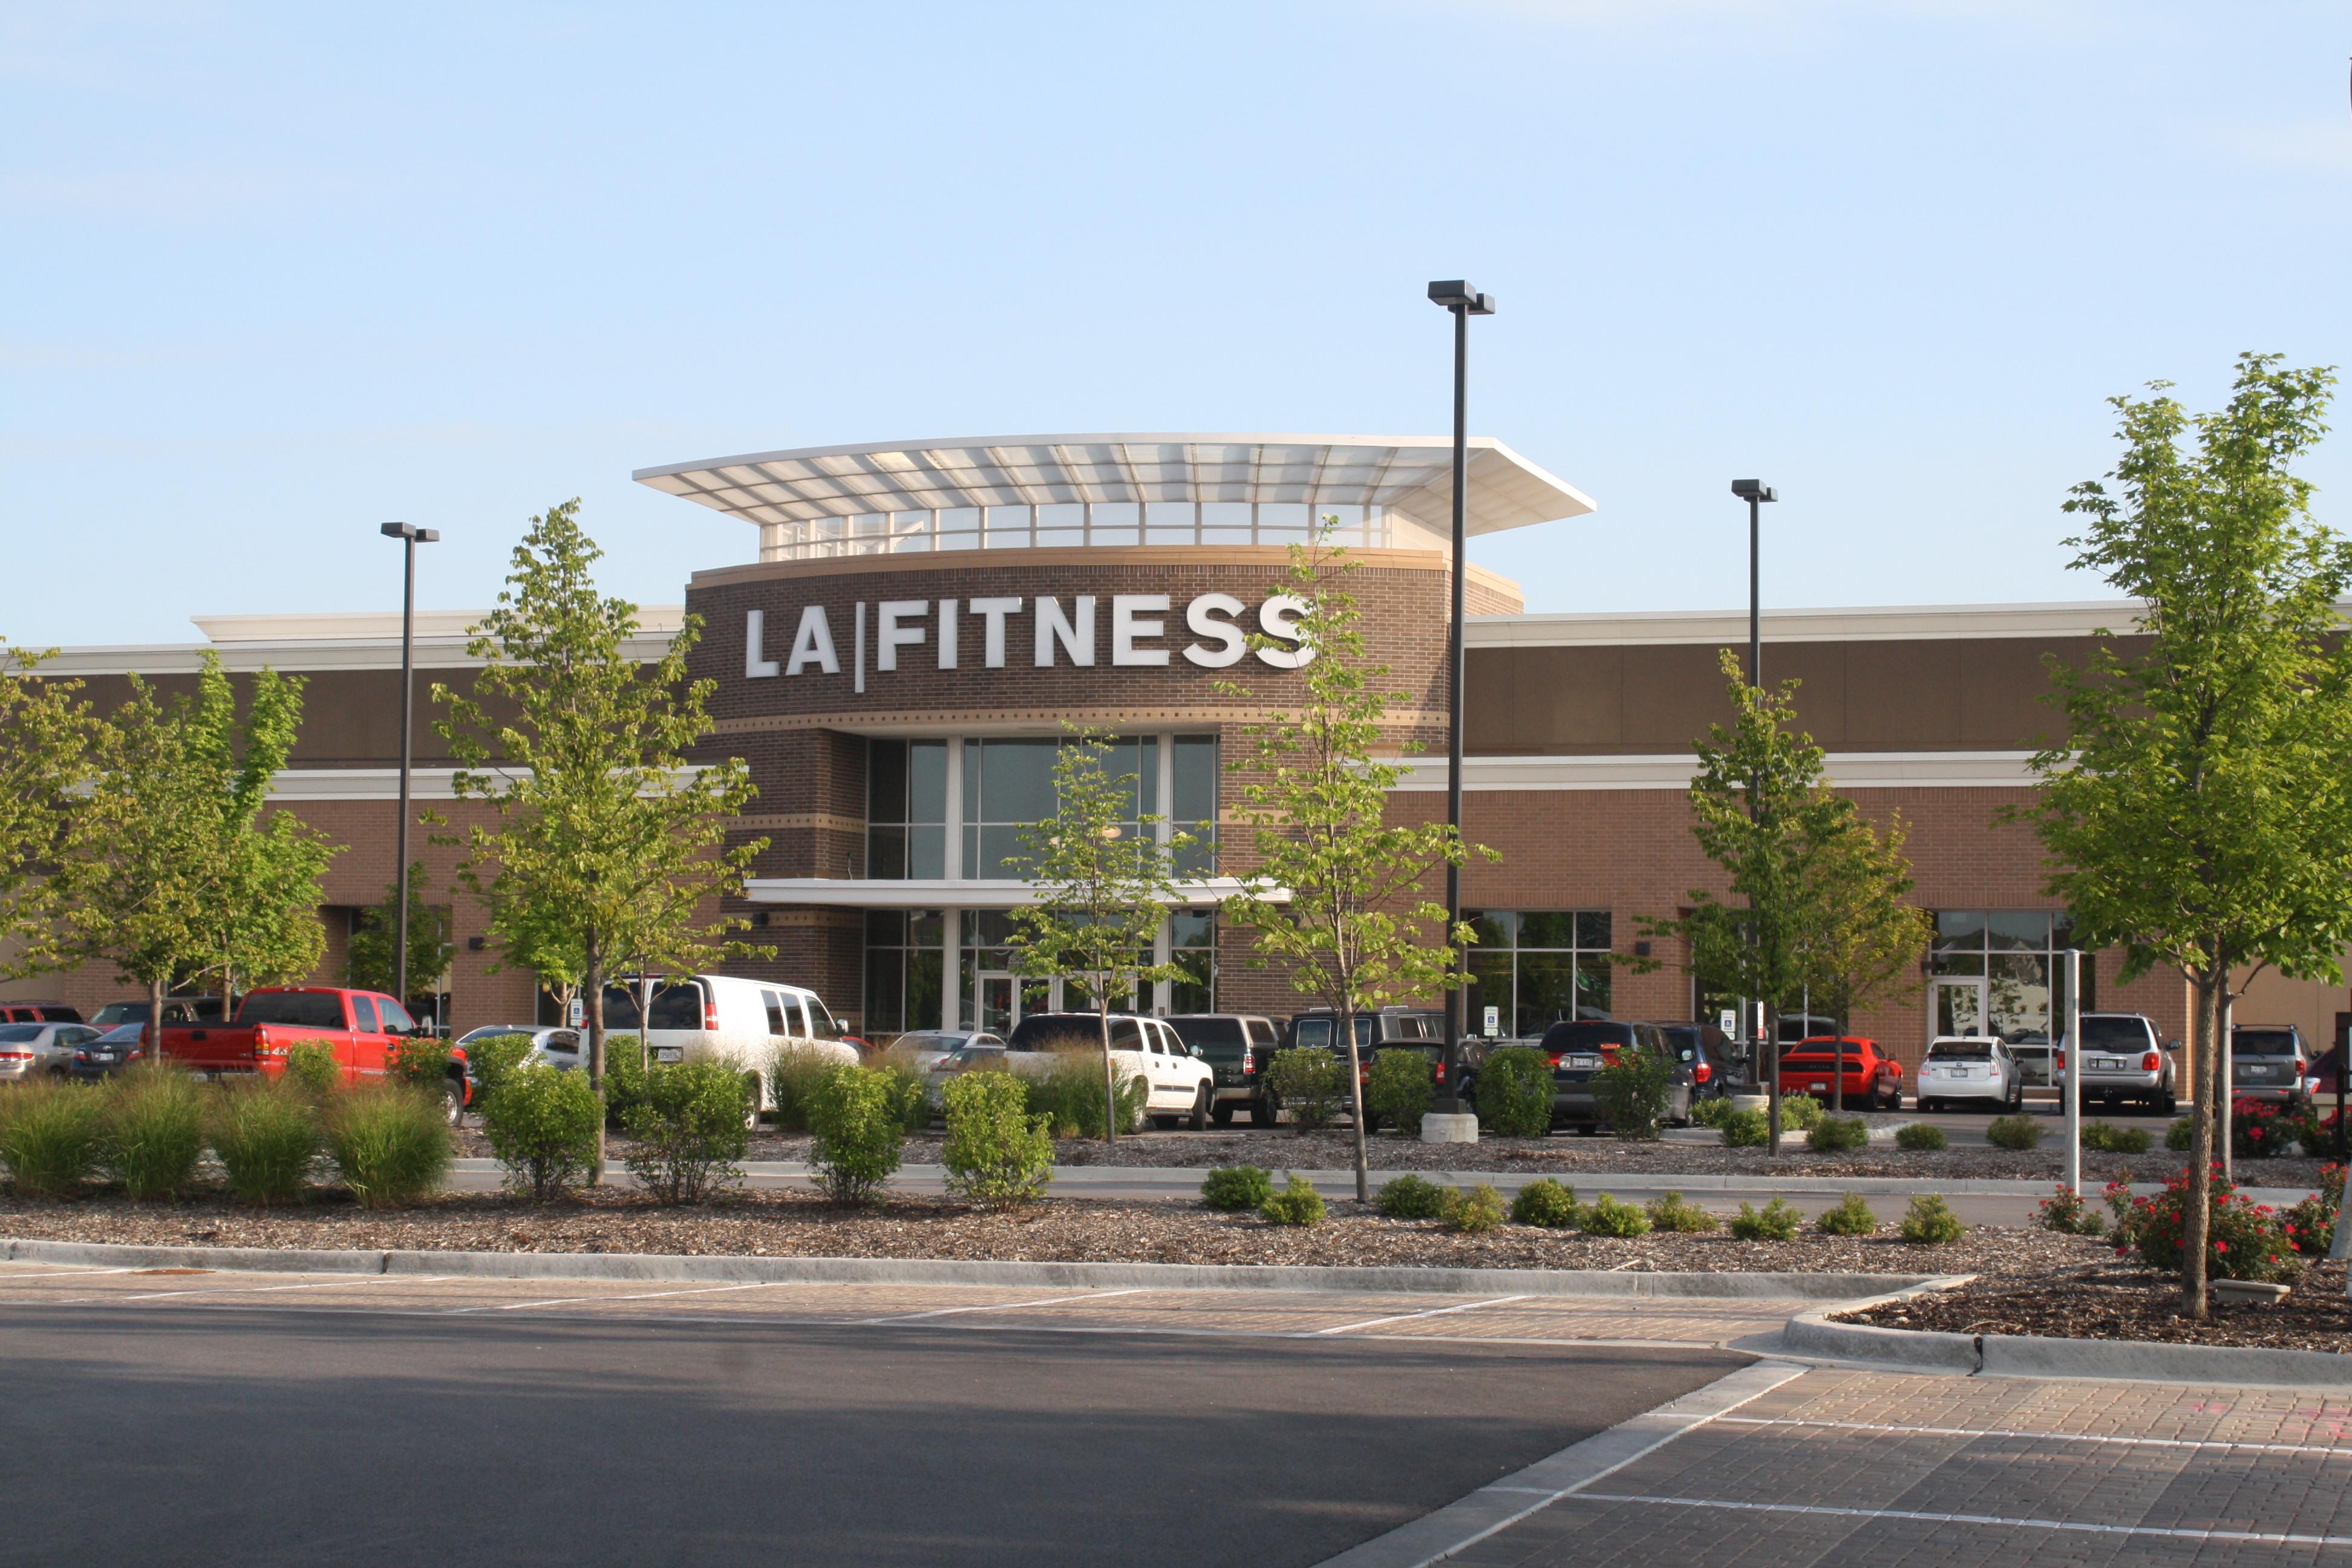 la fitness for sale